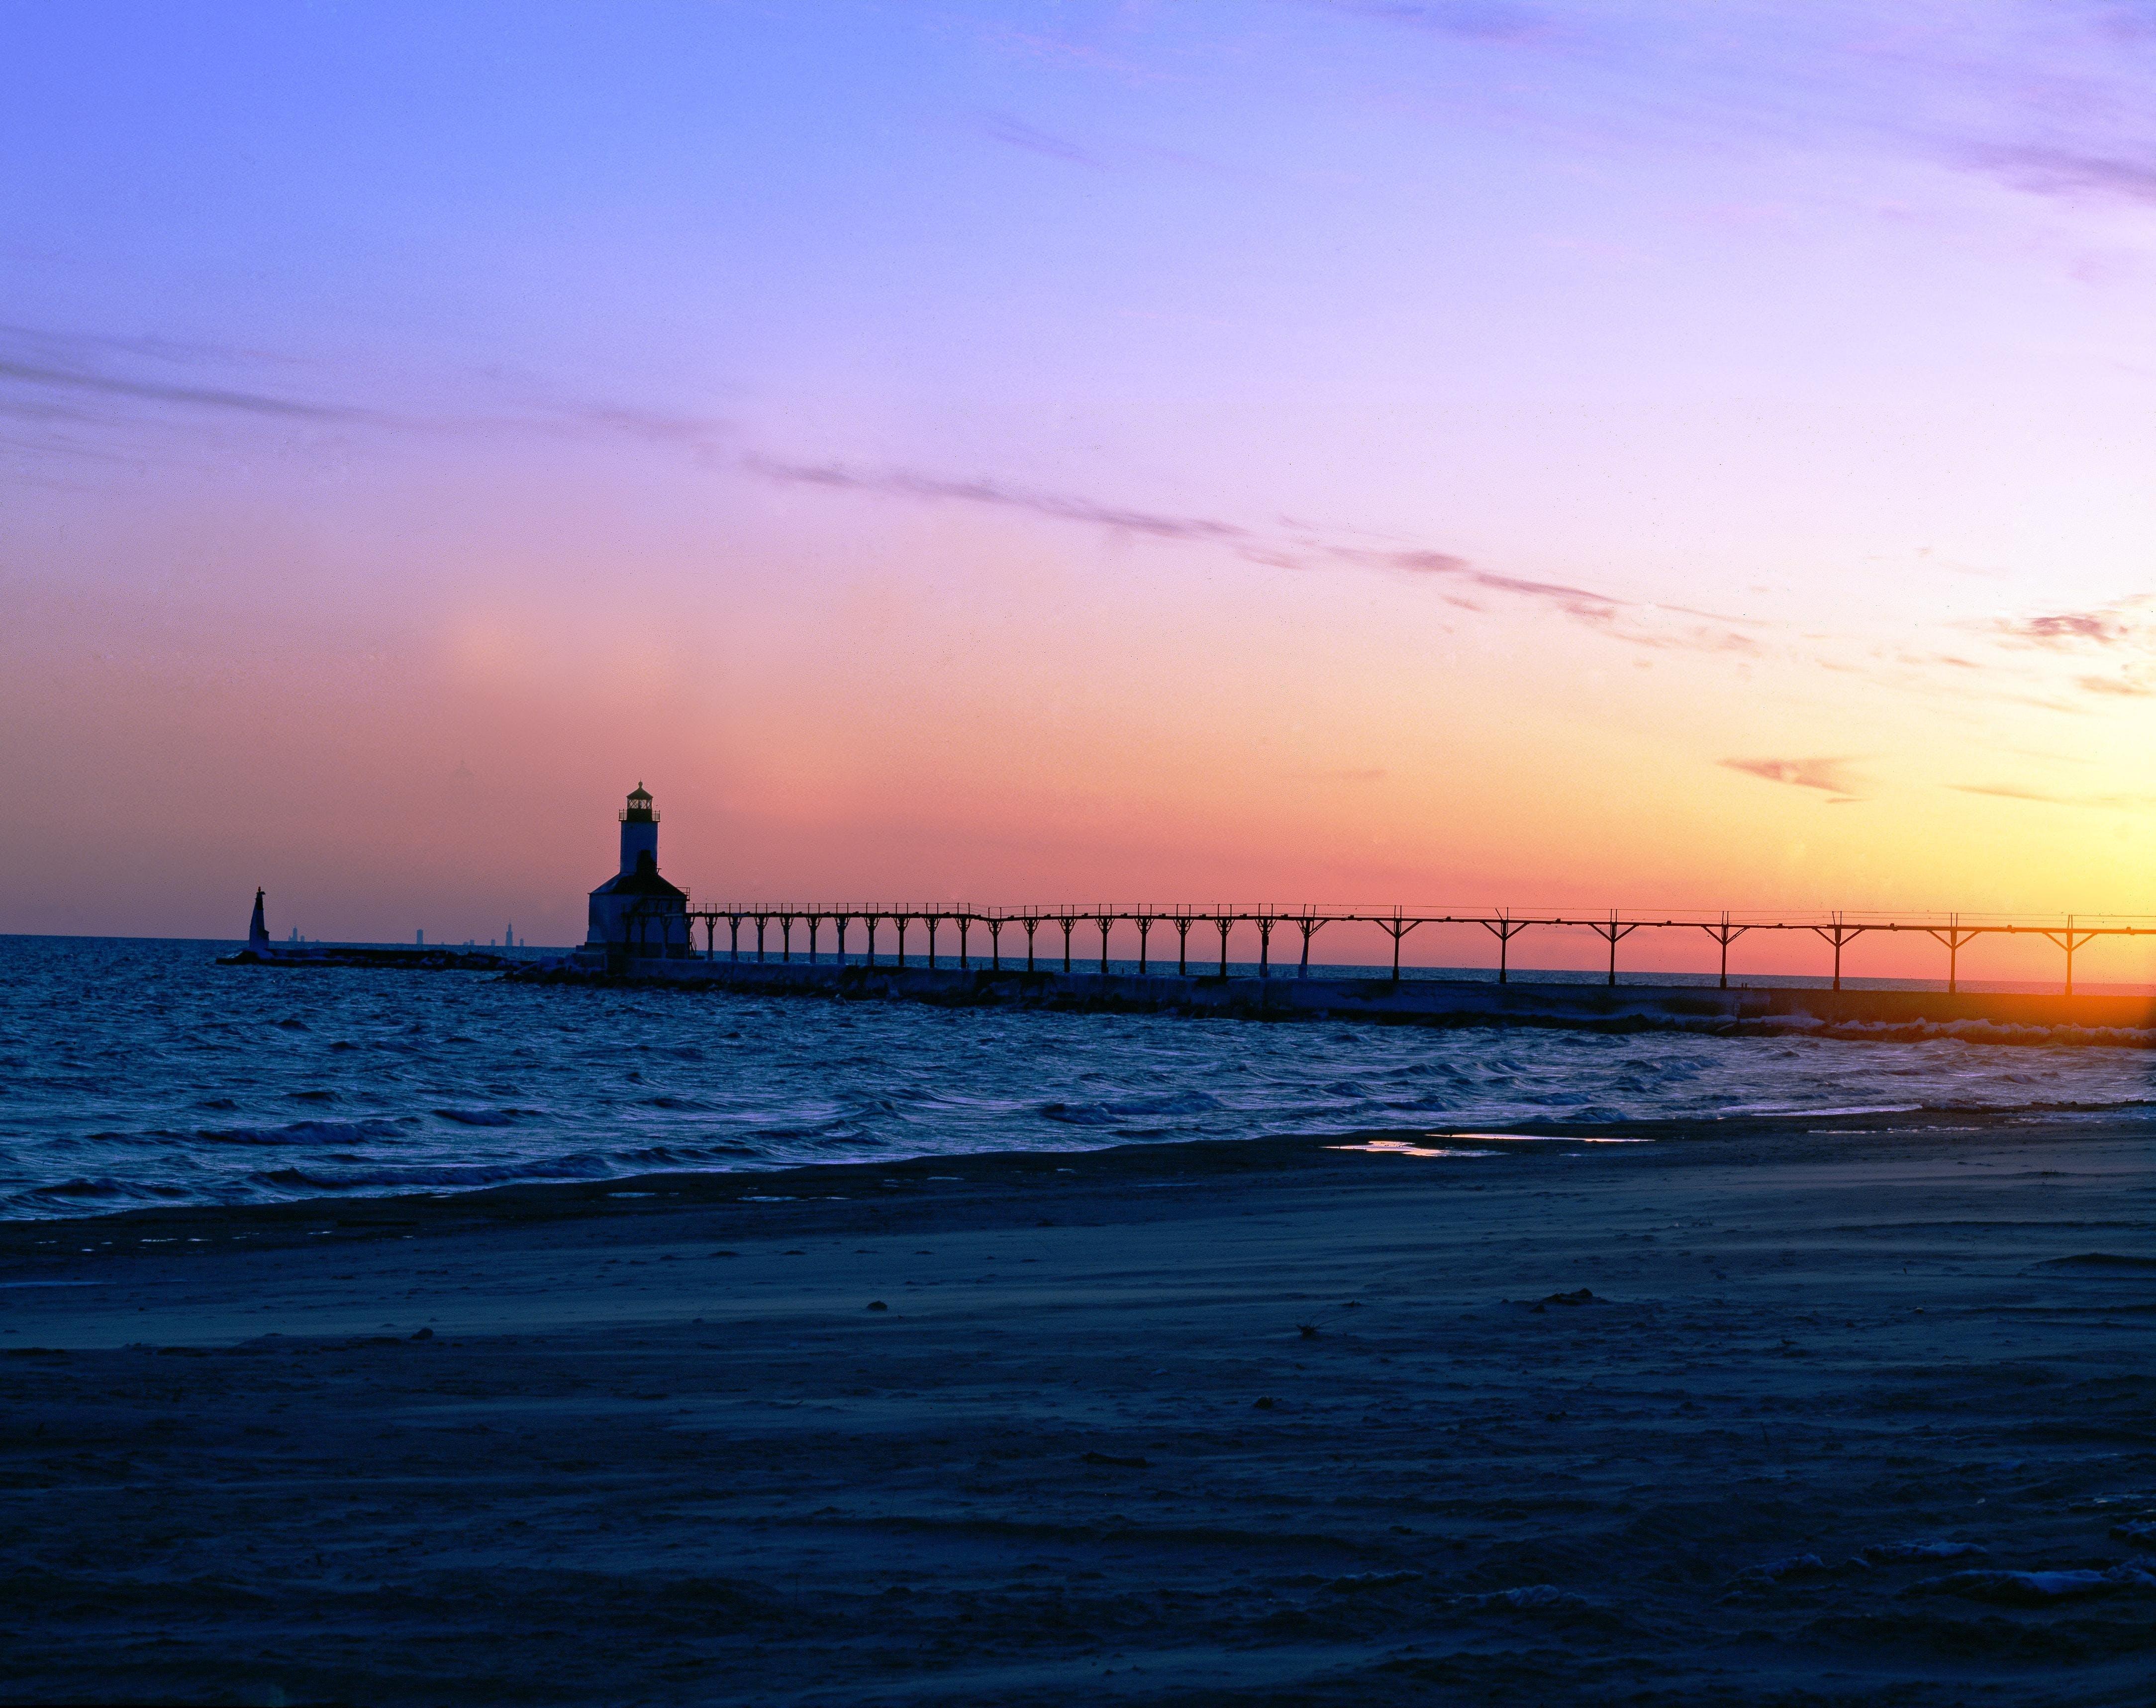 Silhouette of Gray Steel Bridge on Sea Shore during Sunset